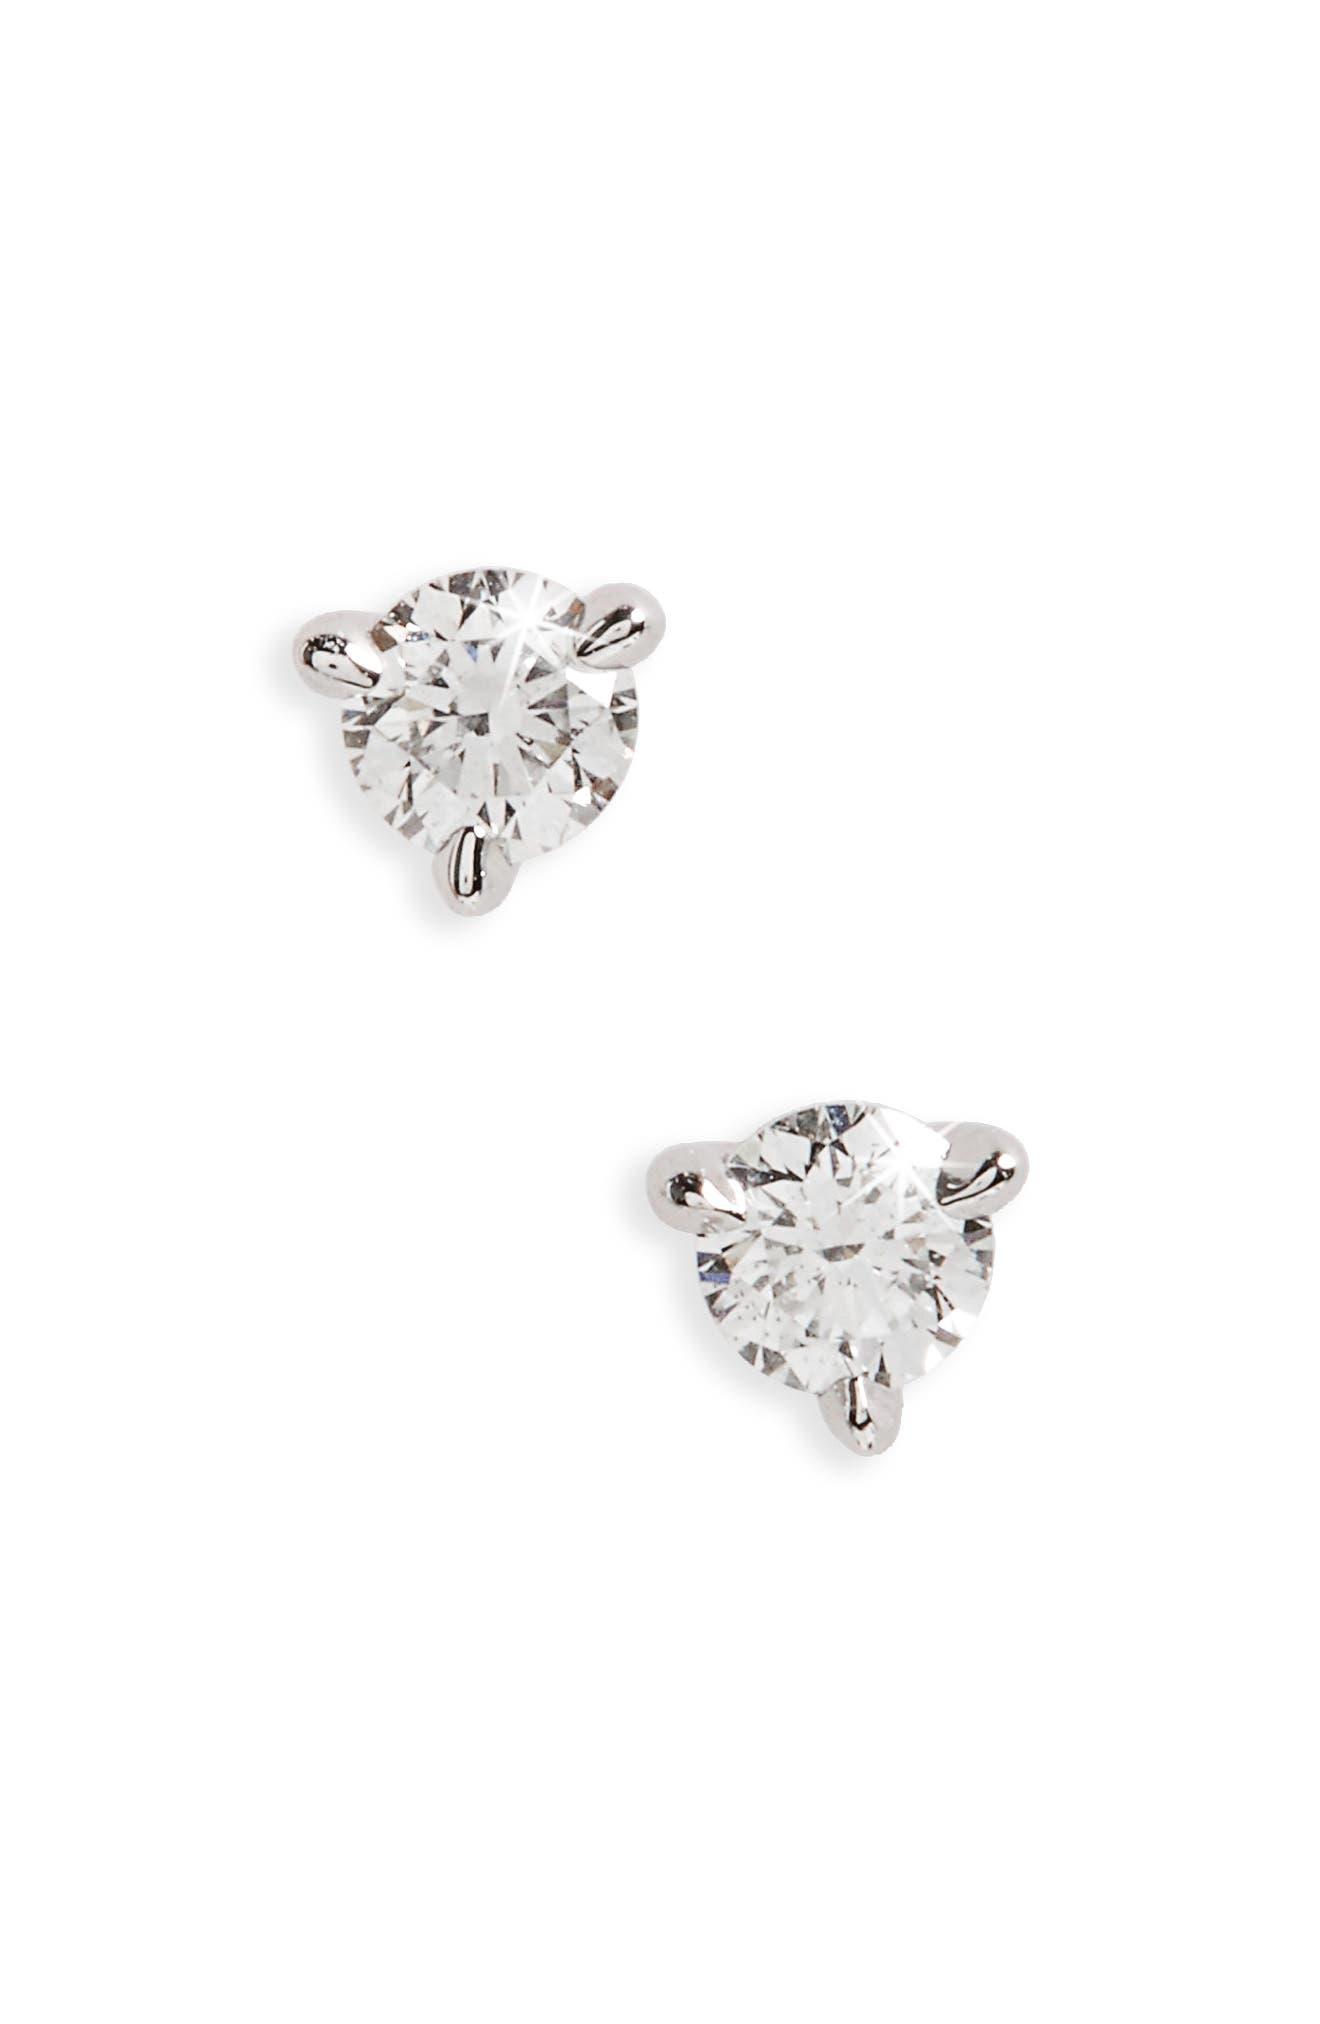 0.25ct tw Diamond & Platinum Stud Earrings,                             Main thumbnail 1, color,                             Platinum